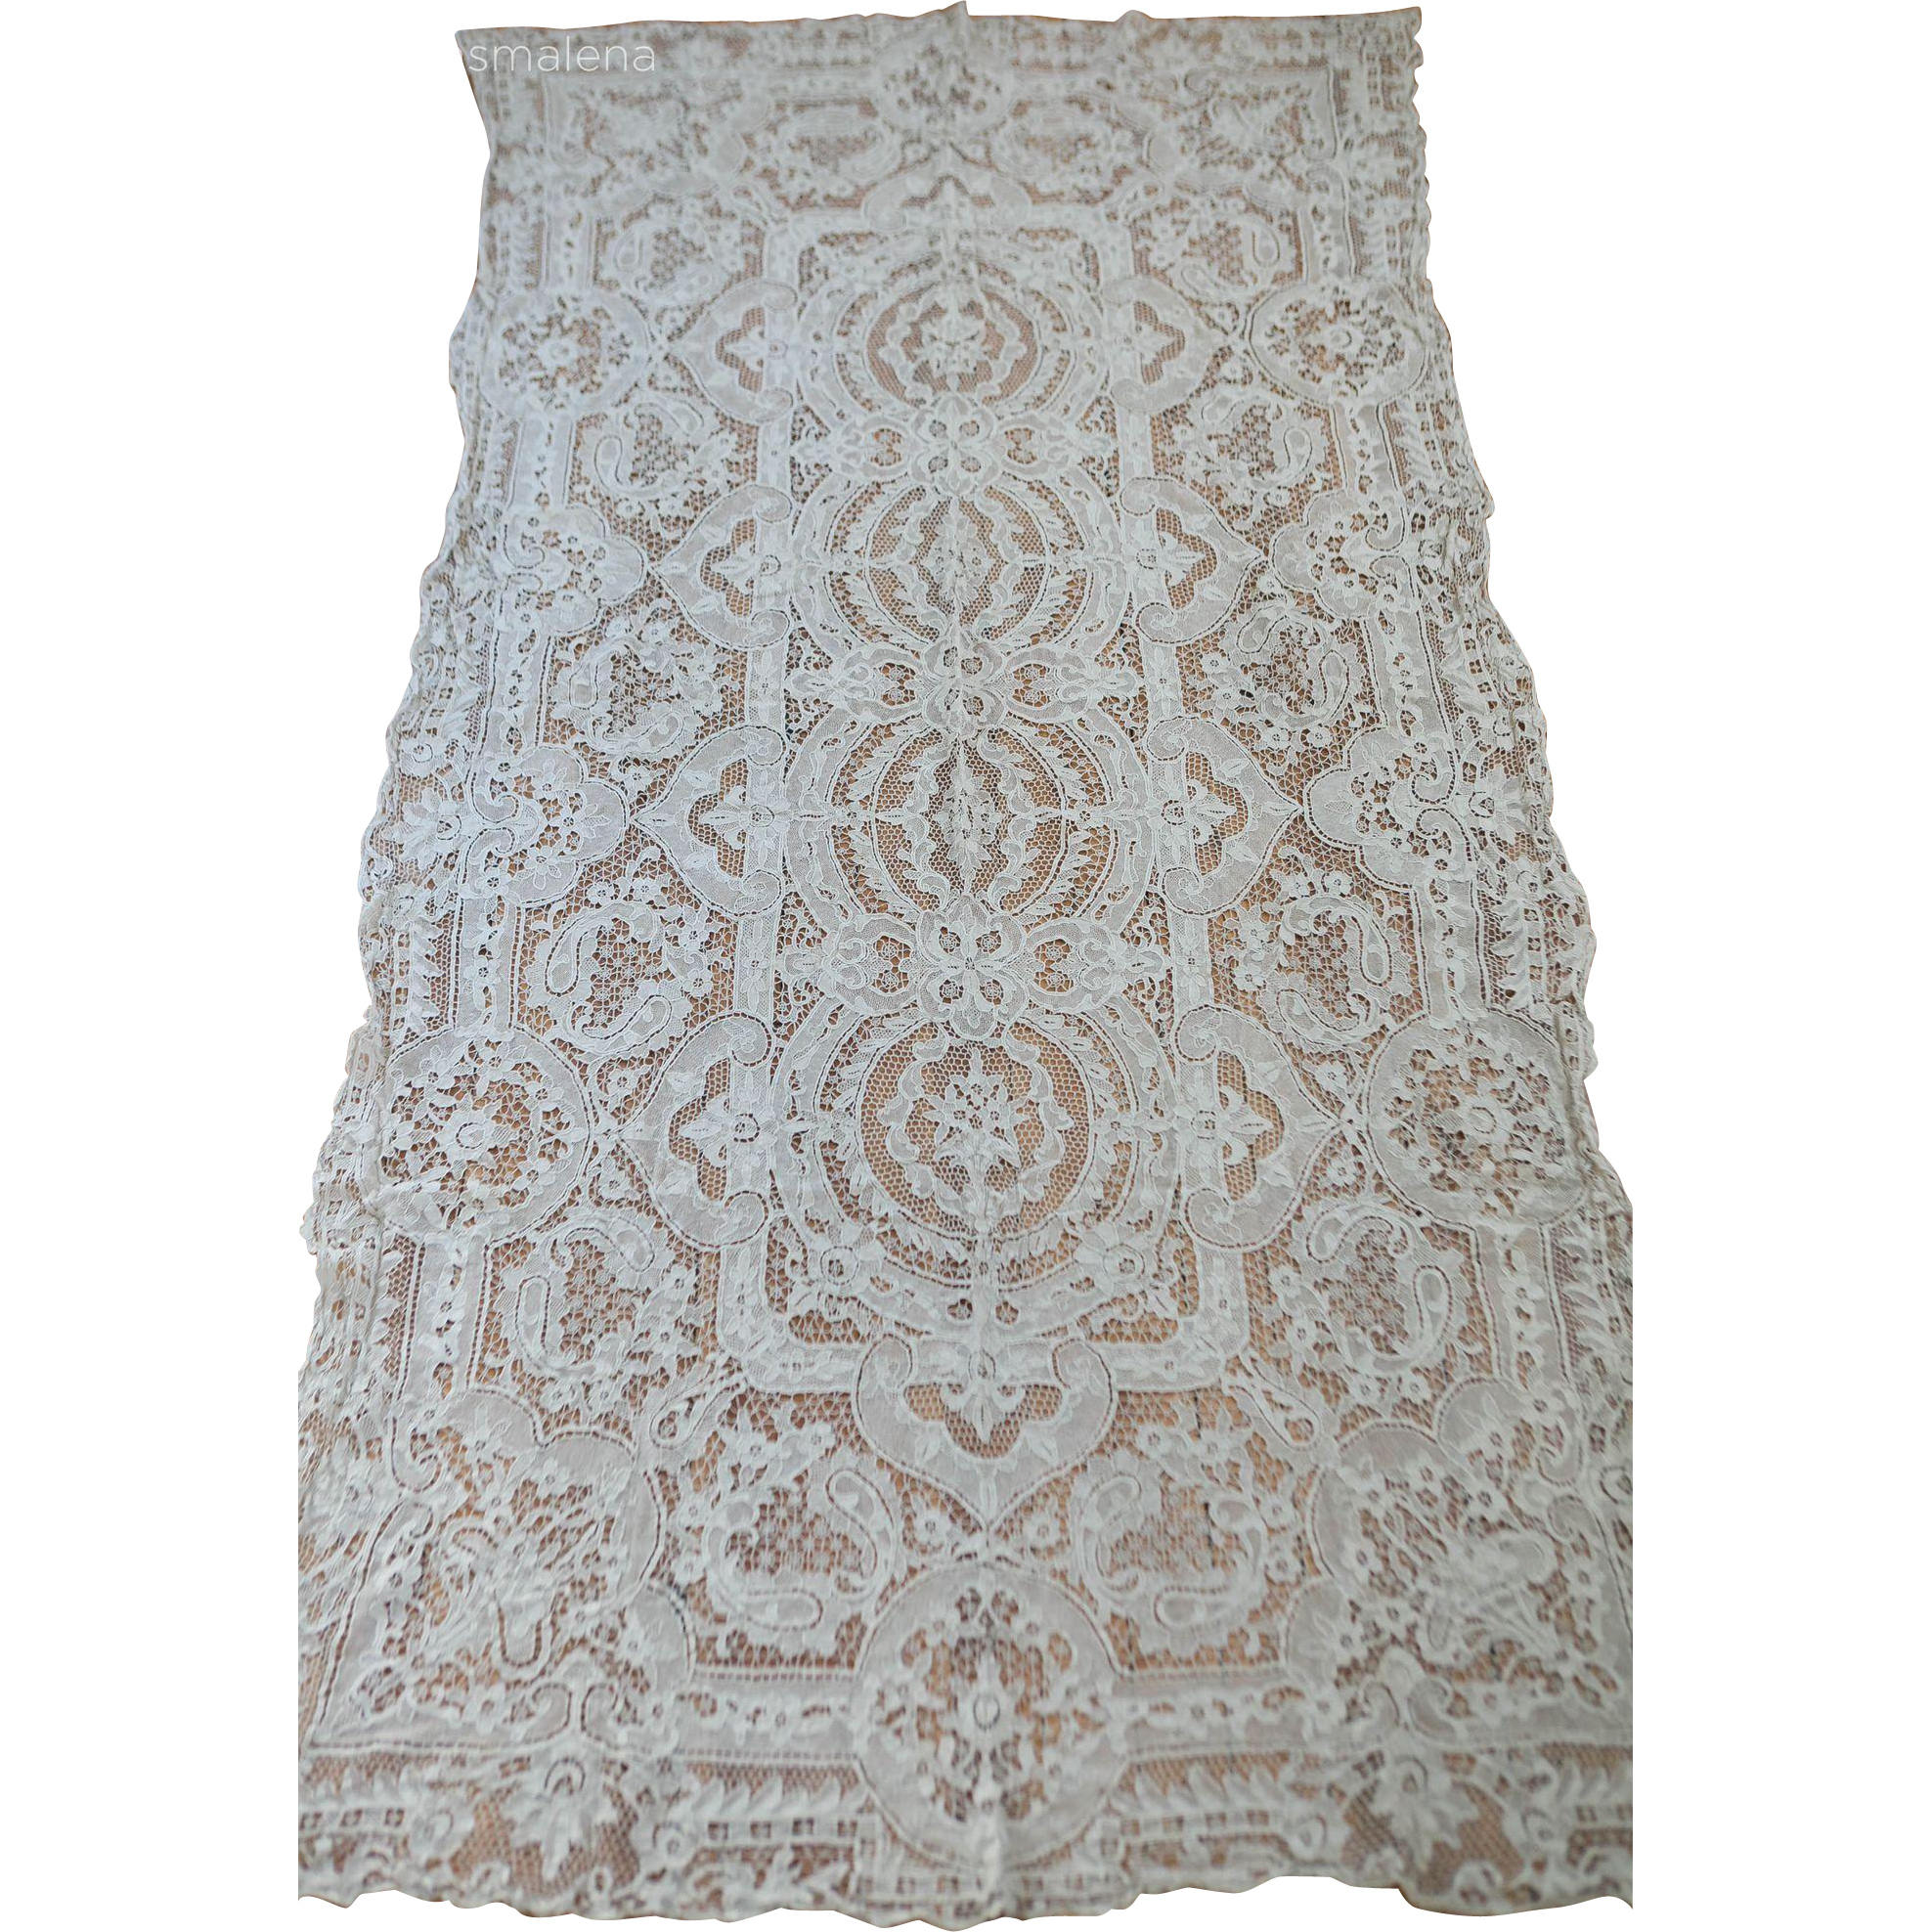 Antique Handmade Italian Reticella Point de Venise Needlelace Floral Banquet Tablecloth or Bedspread